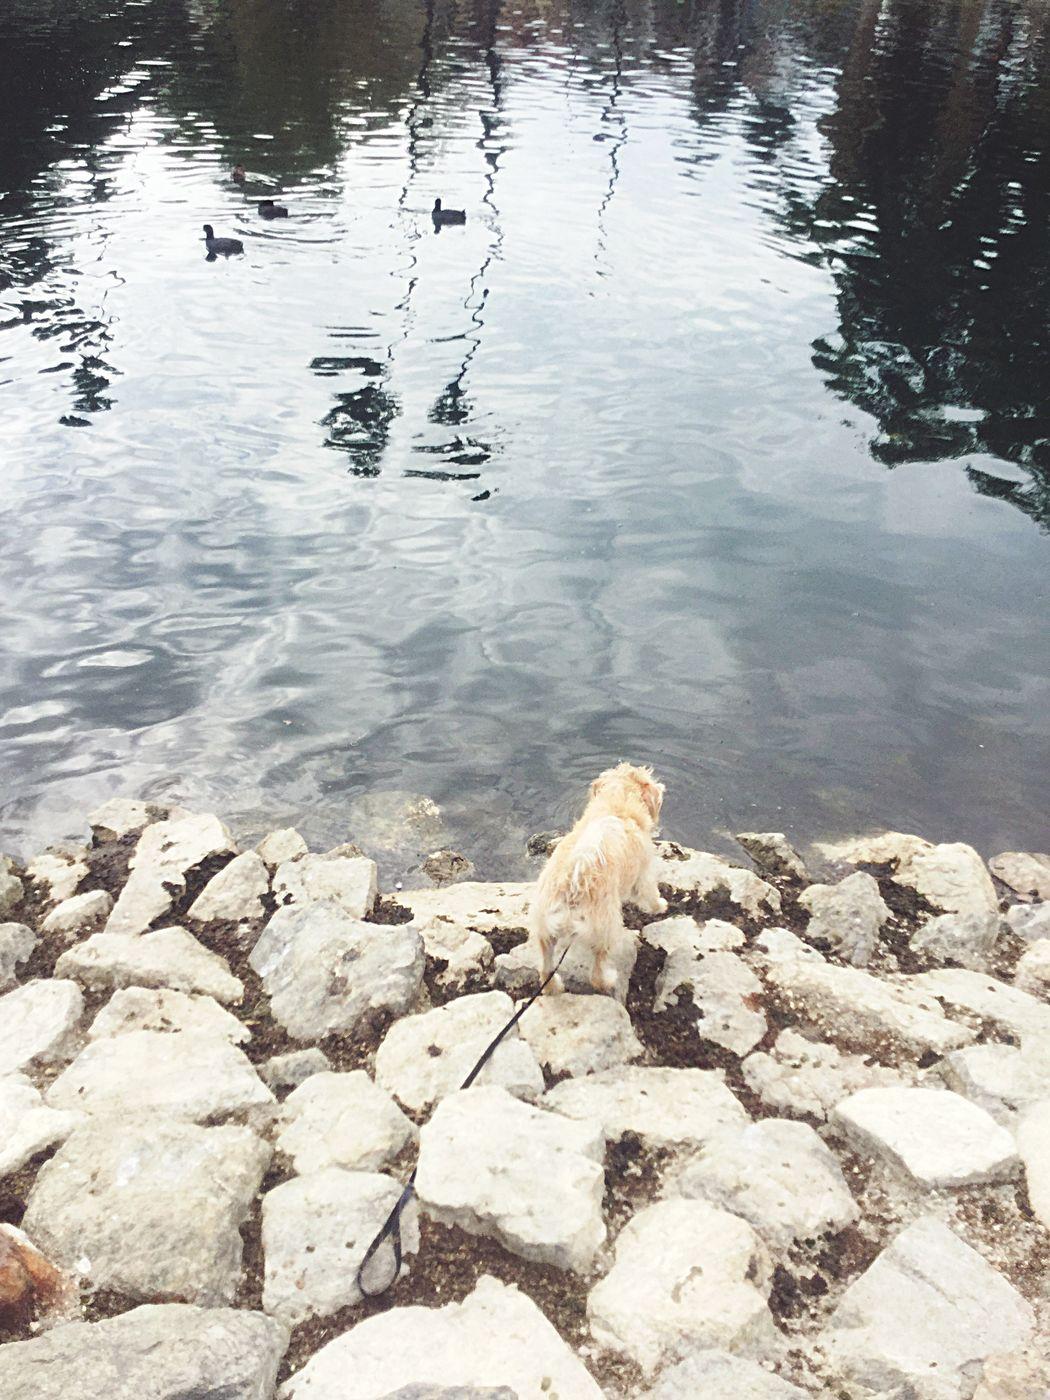 Echo Park Lake Keoki Ducks Rocks Rocks And Water Dog One Animal Animal Themes Pets Water Domestic Animals Mammal Nature Day No People Outdoors